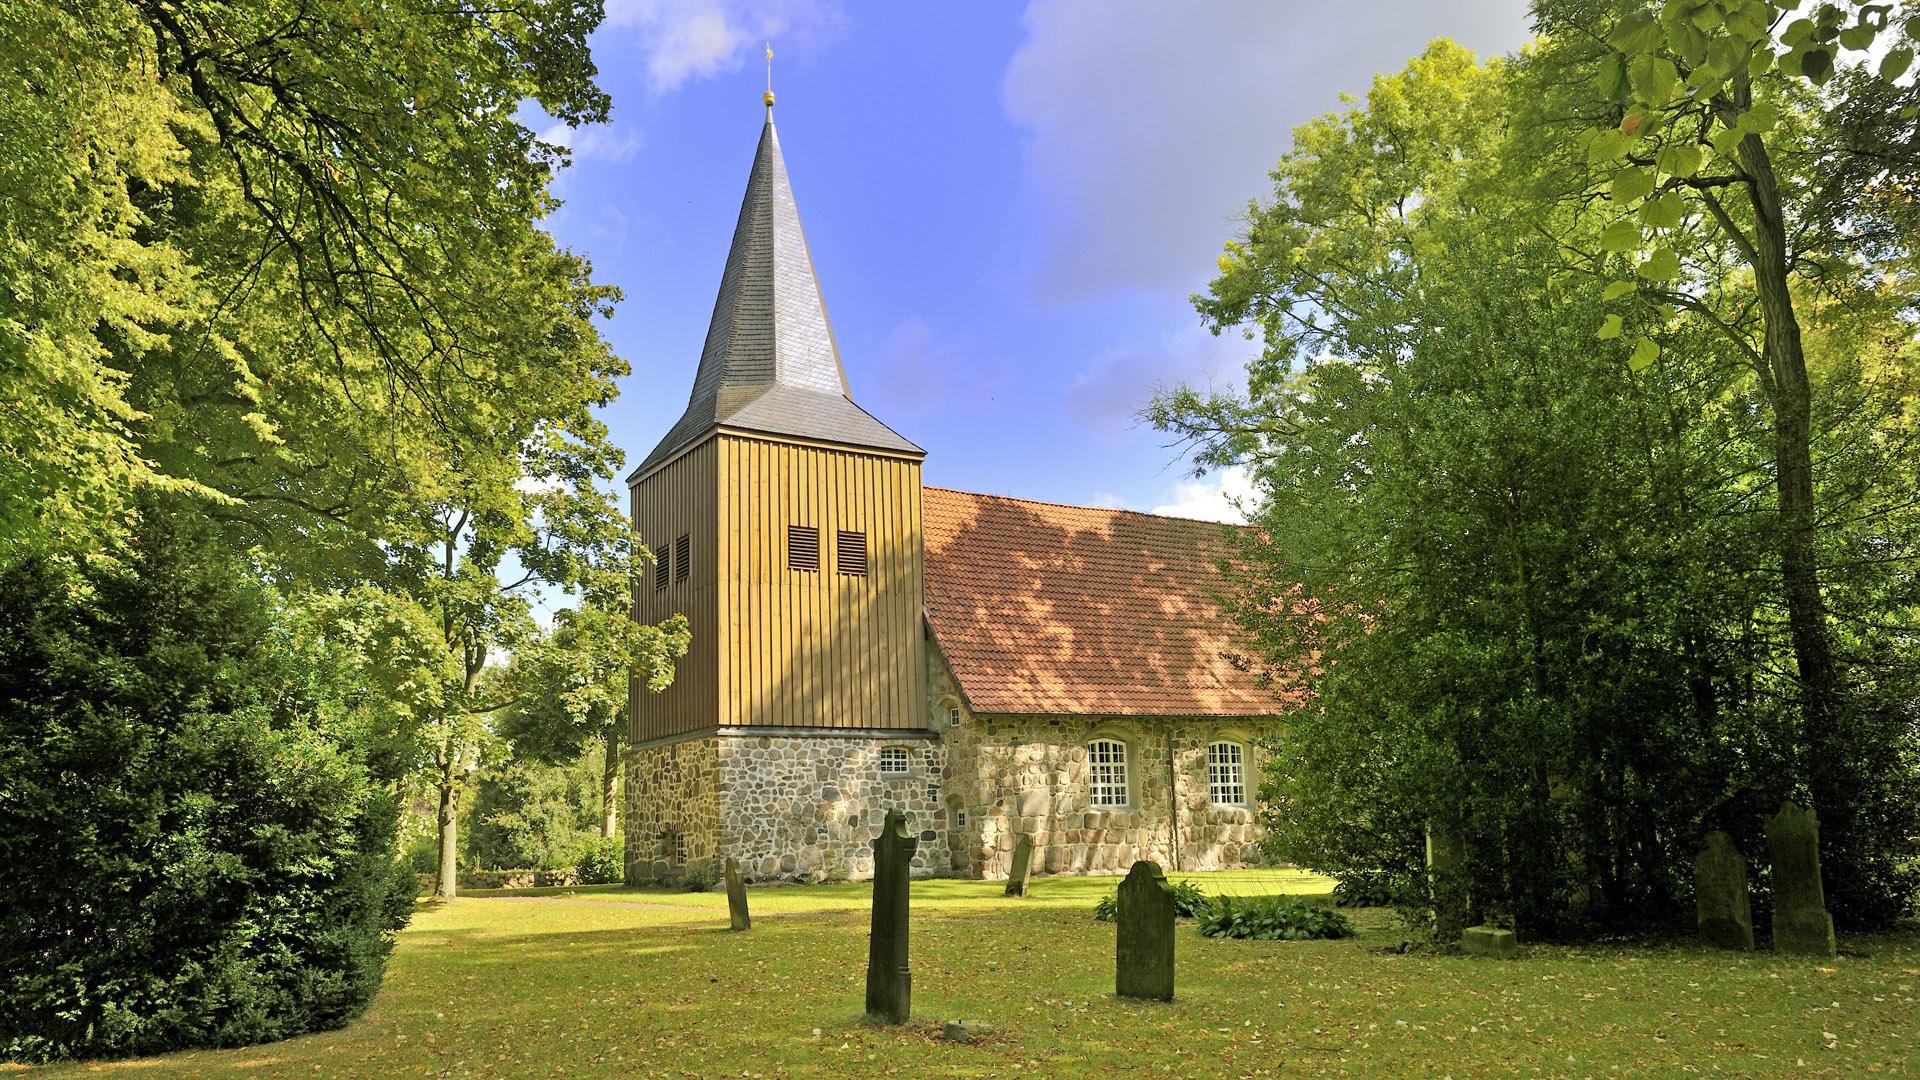 Eindrucksvoll - die Gangolf-Kirche in Oerel